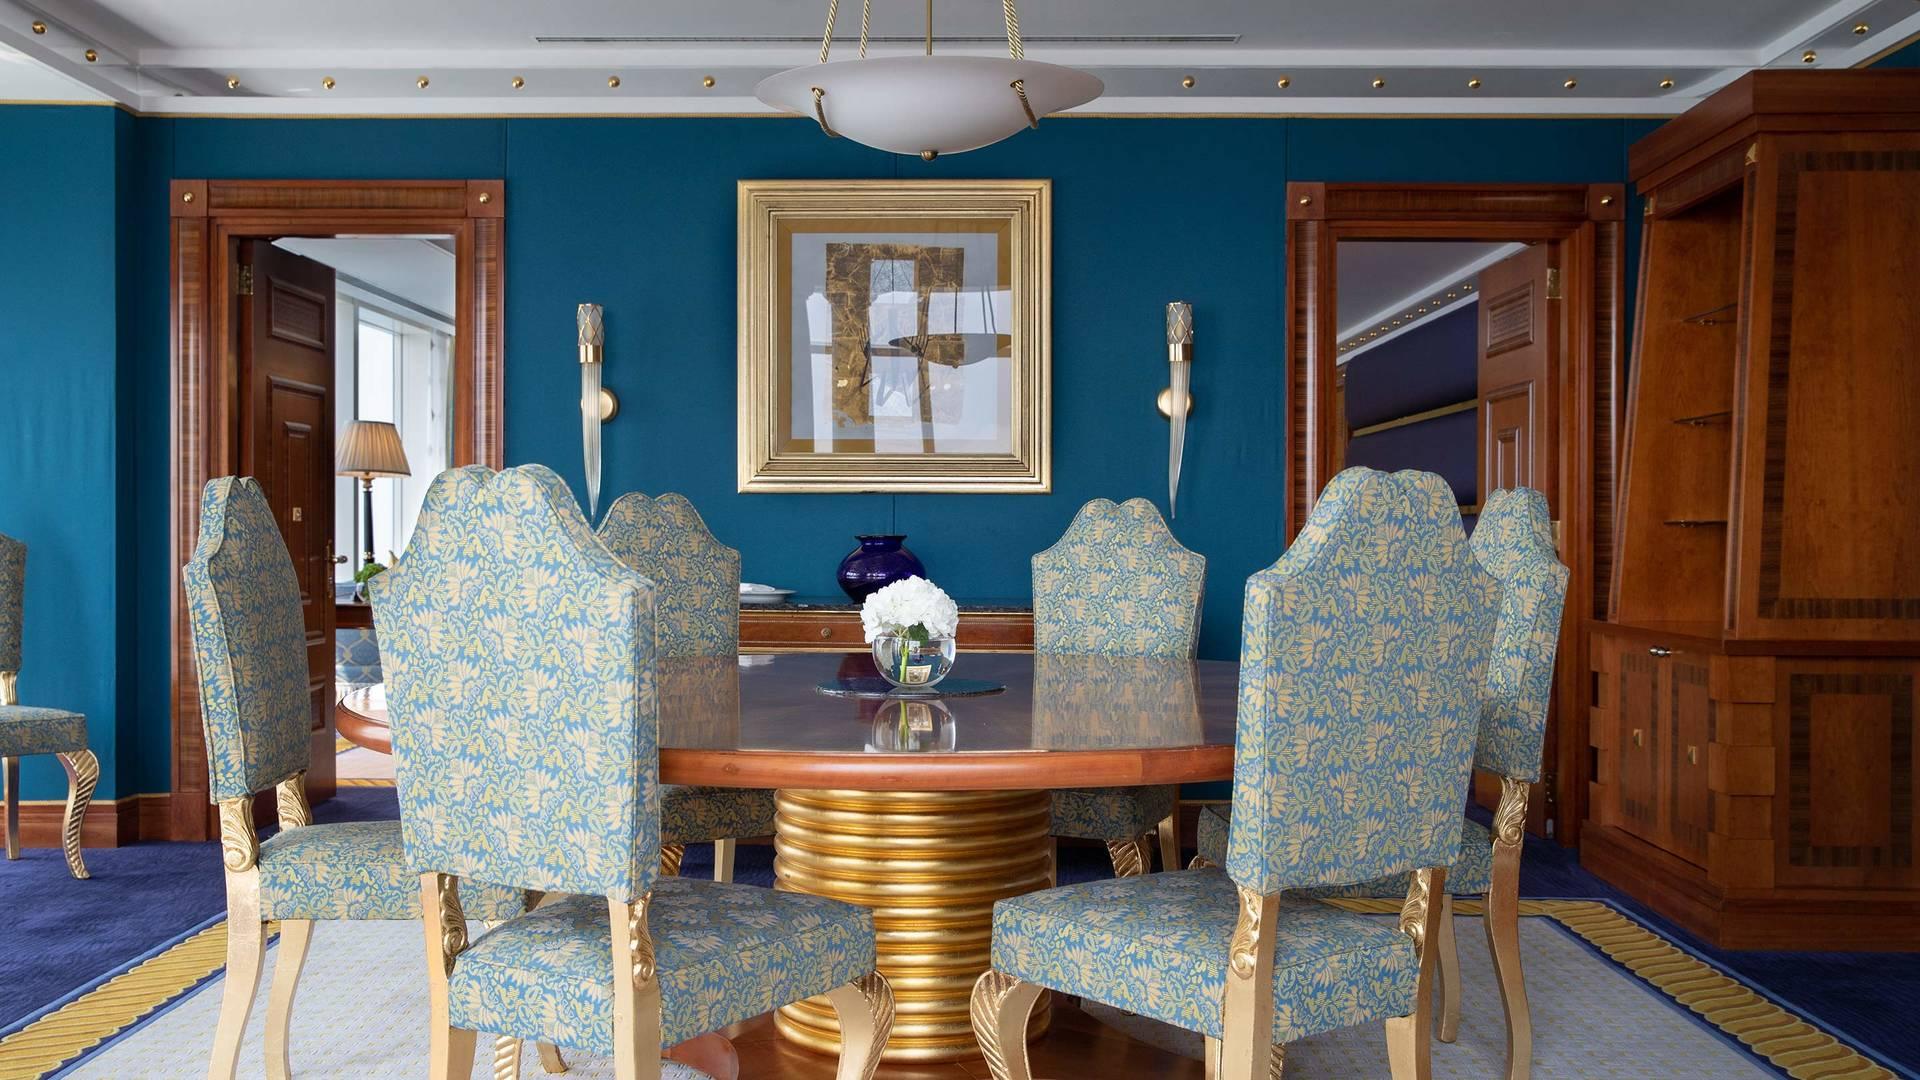 Jumeirah Burj Al Arab club suite dining room_16-9